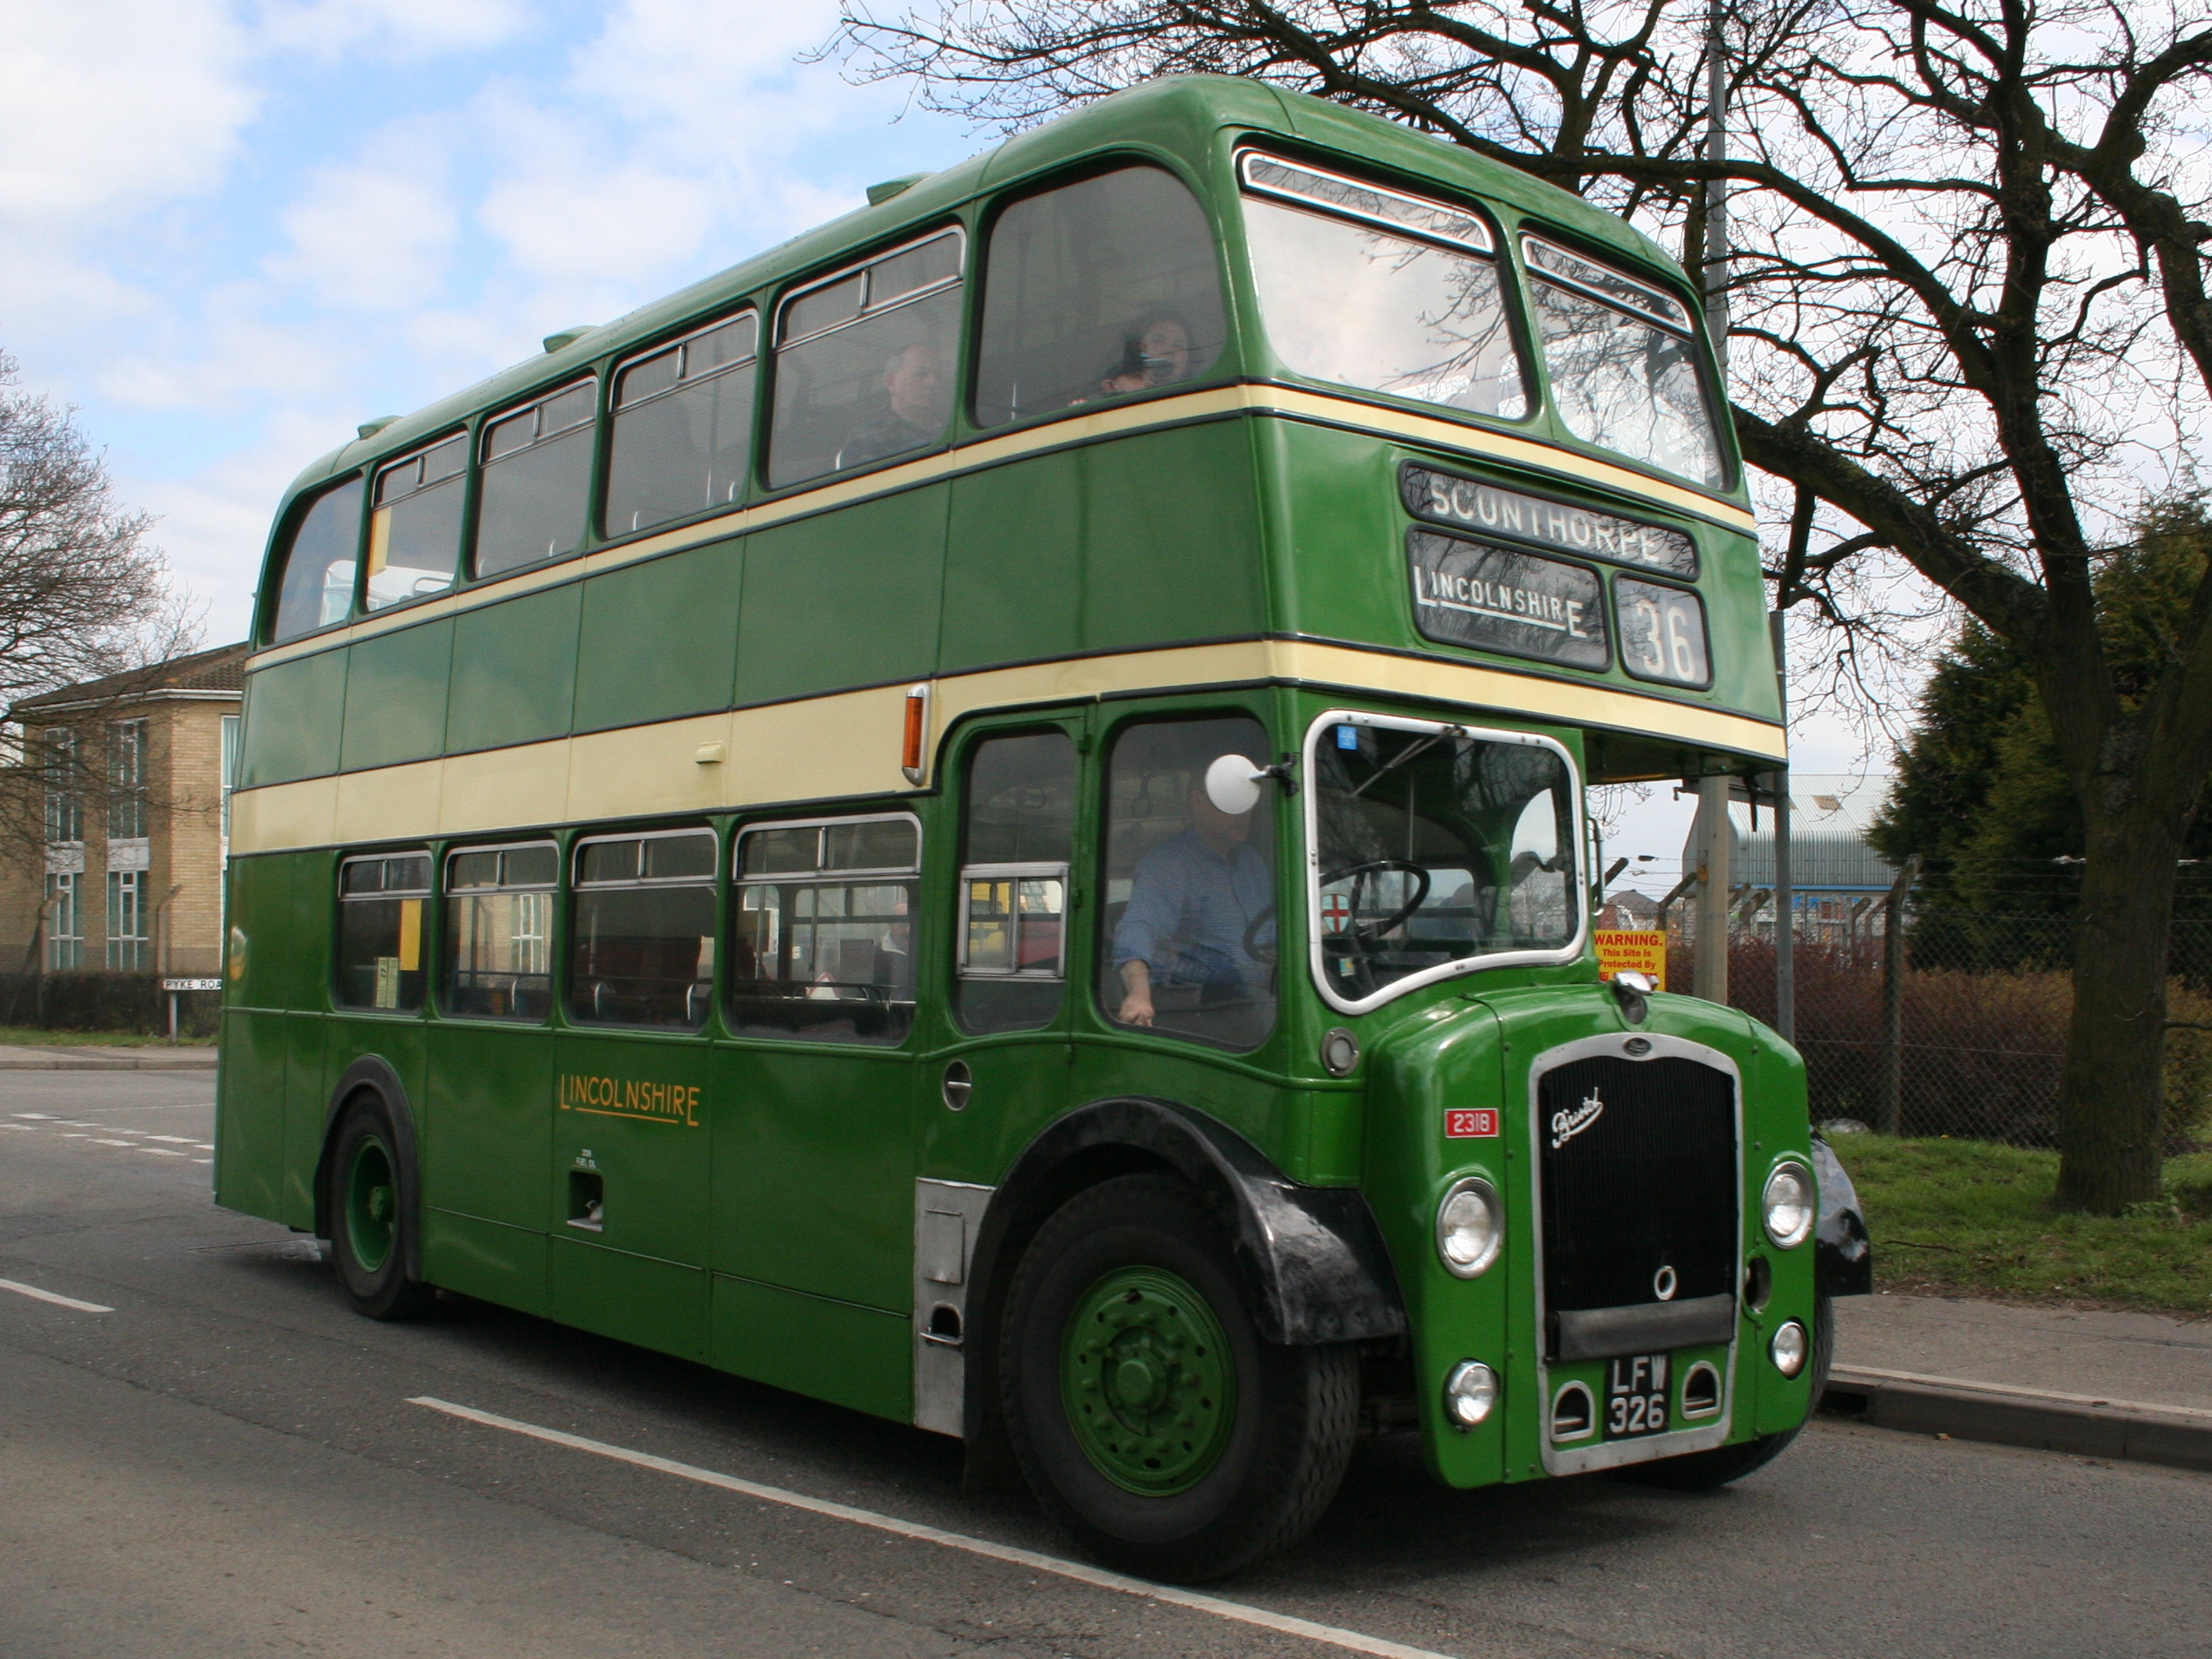 Ship A Car >> File:Lincolnshire Road Car bus 2318 (LFW 326), 2006 ...